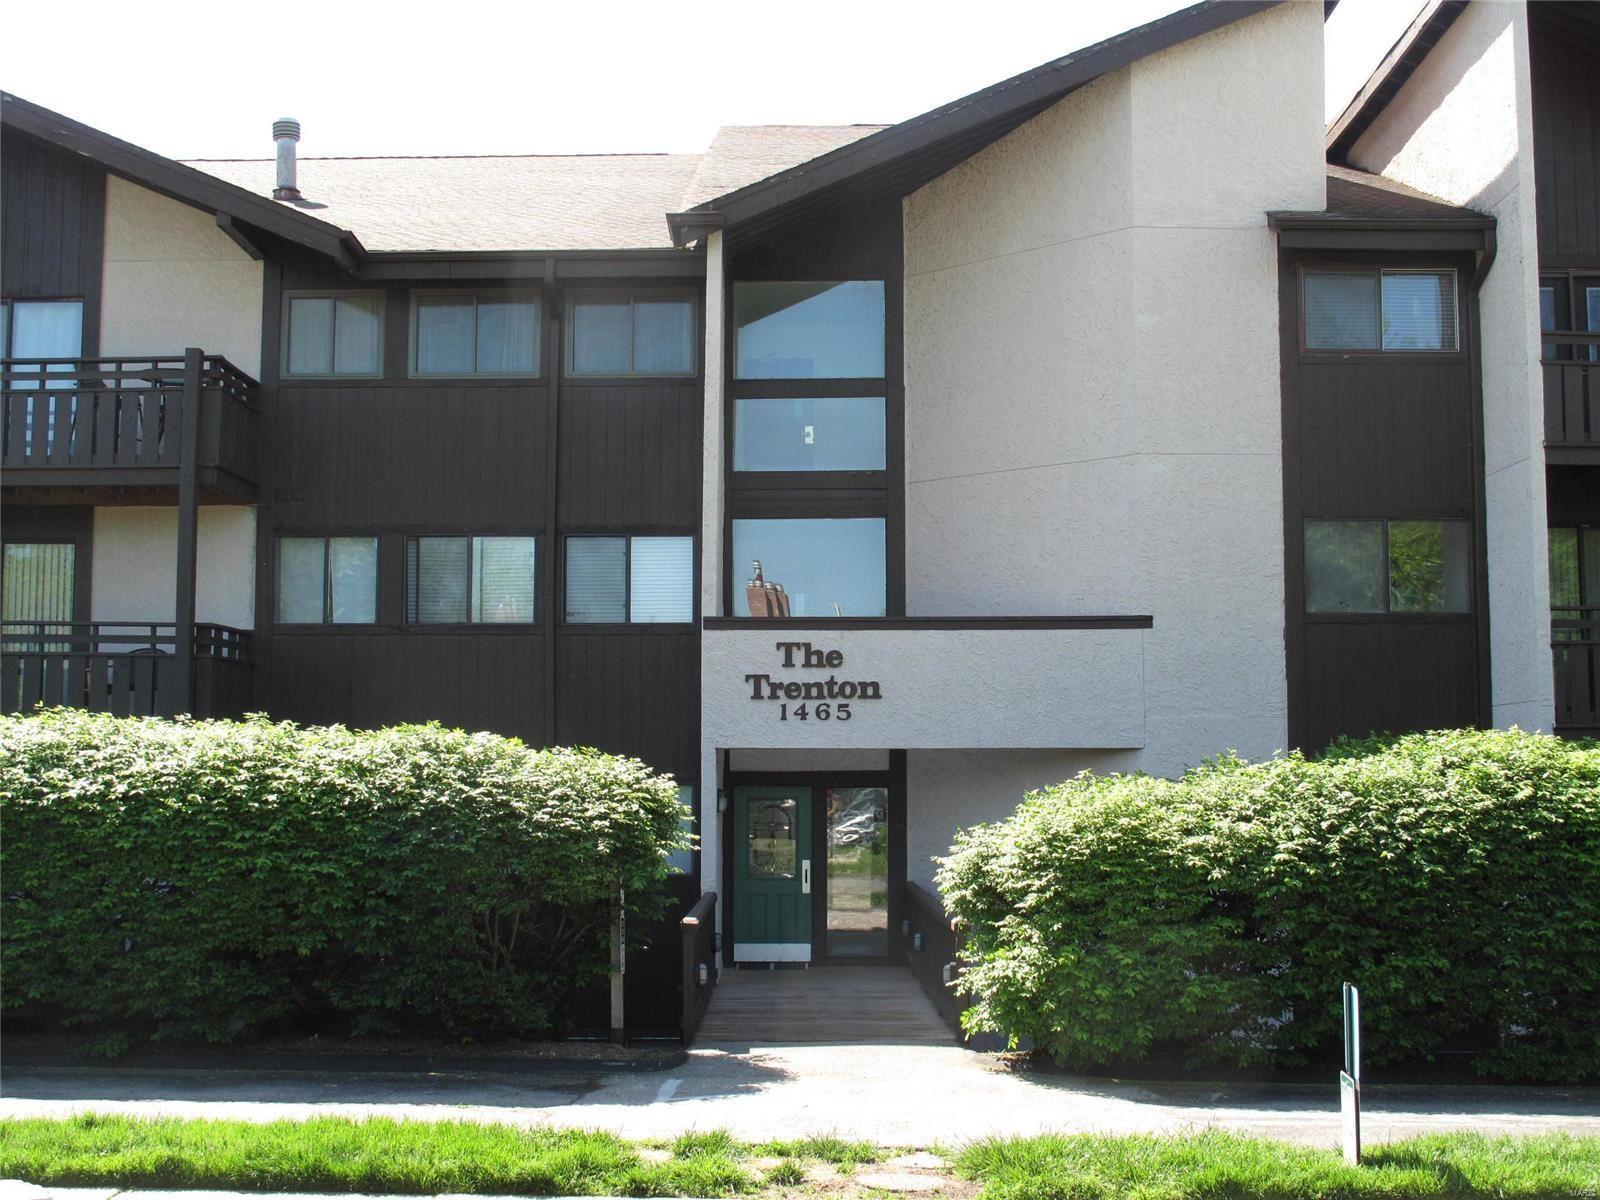 1465 Heritage Lndg, Saint Charles, MO 63303 - MLS#: 21027833